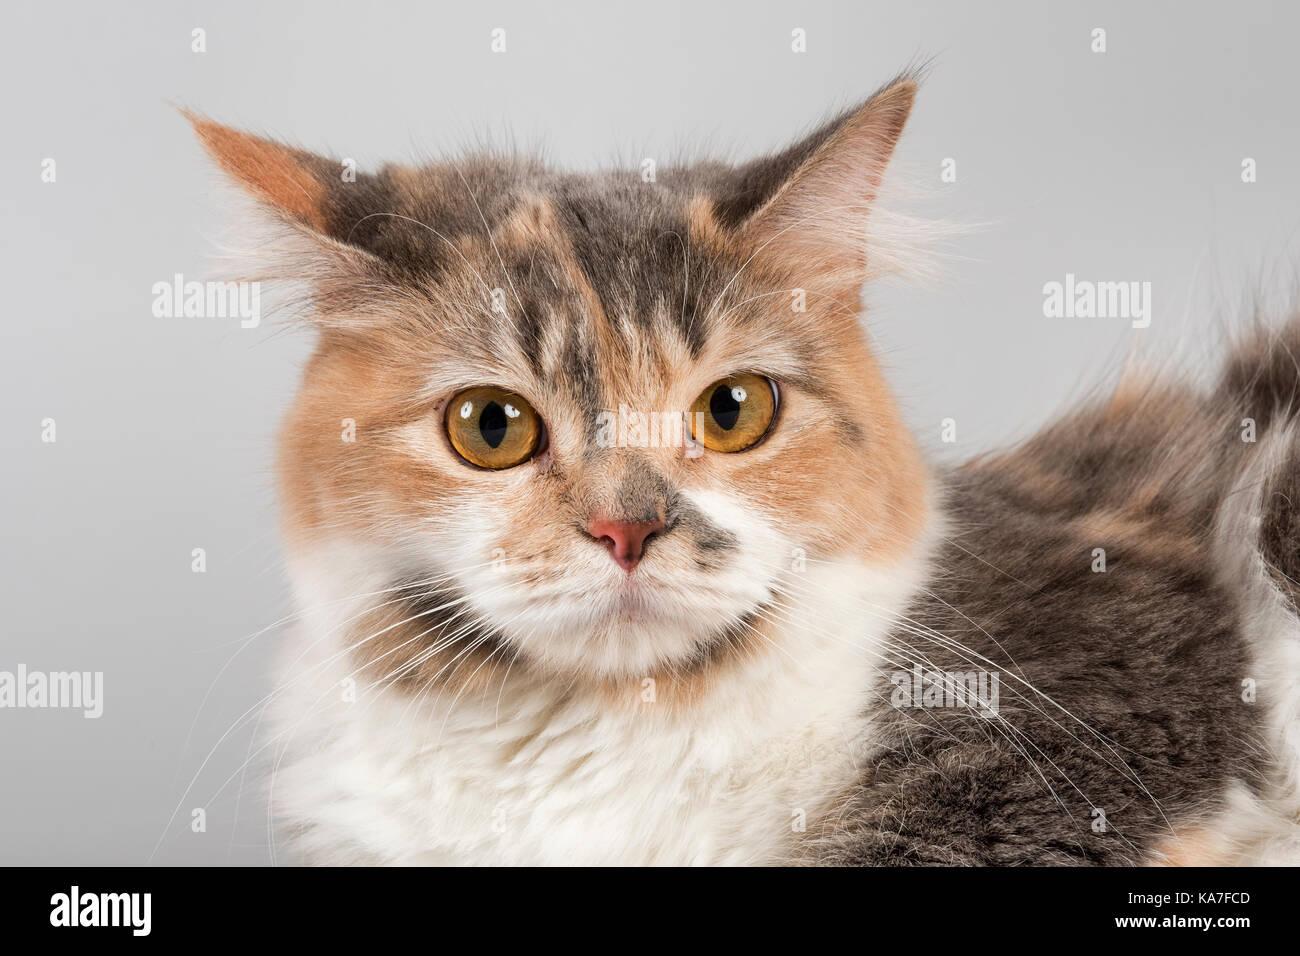 Pedigree cat Manx-Cymric (Felis silvestris catus), age 1 year, color blue with white - Stock Image